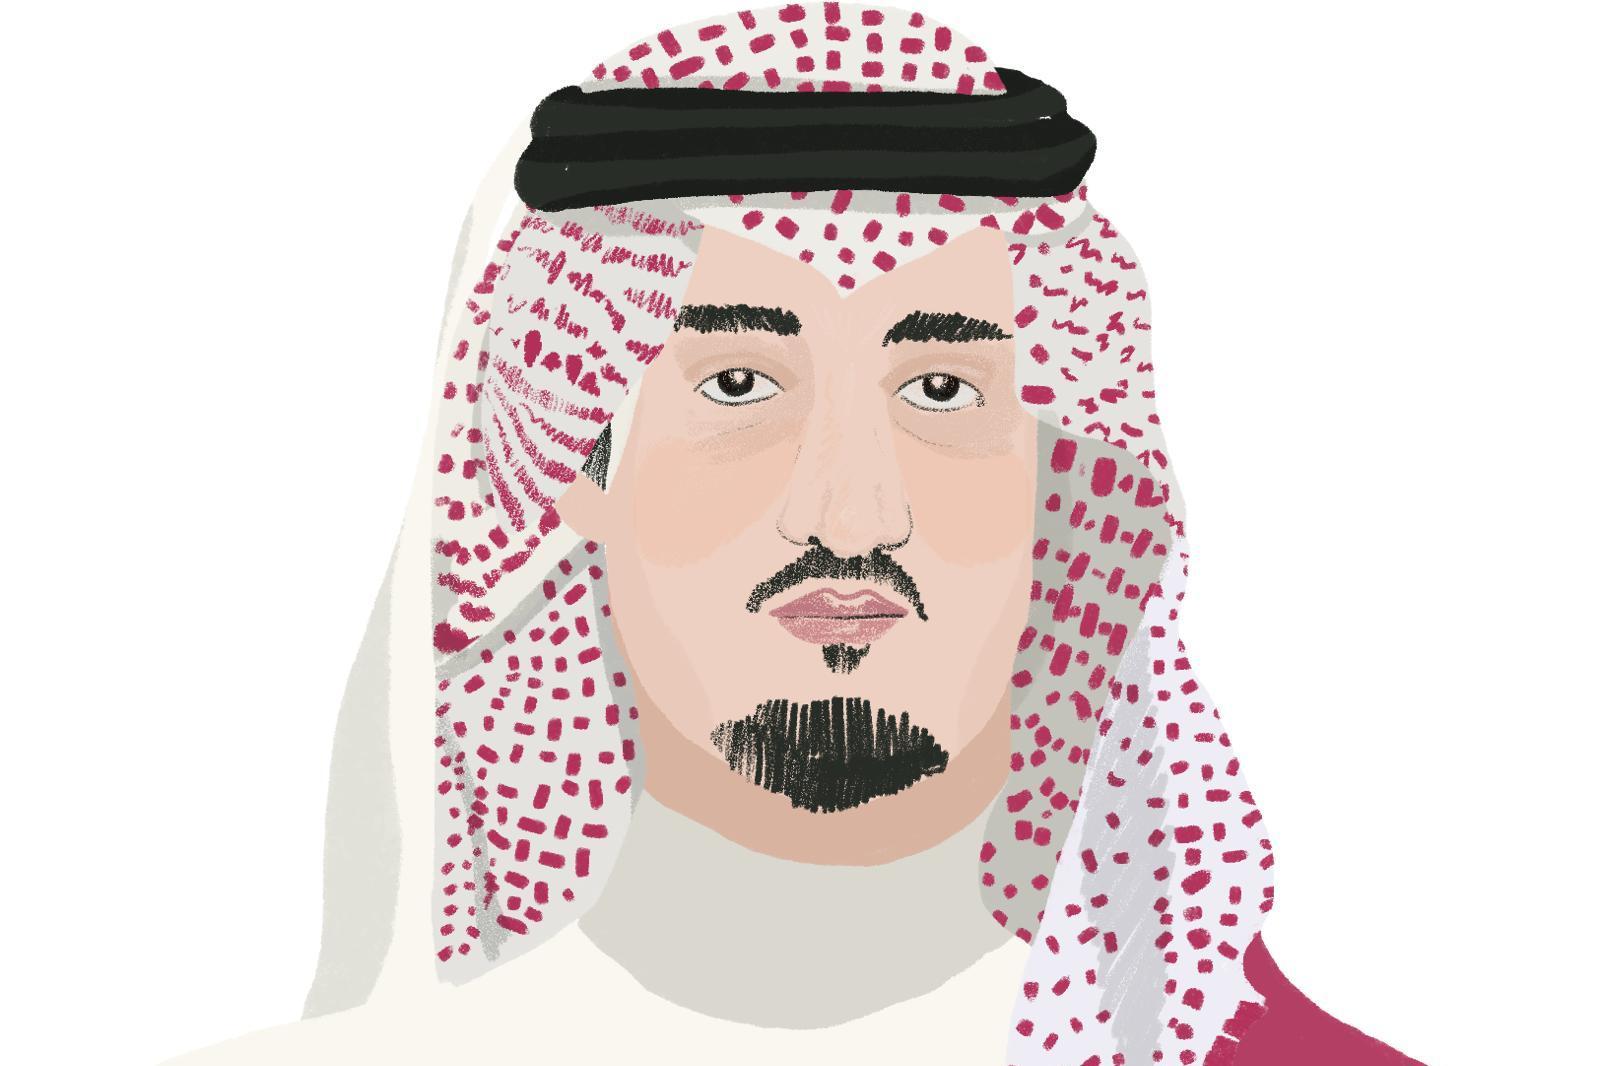 A sketch of Prince Bander Al Saud. Sketch: The Daphne Caruana Galizia foundation